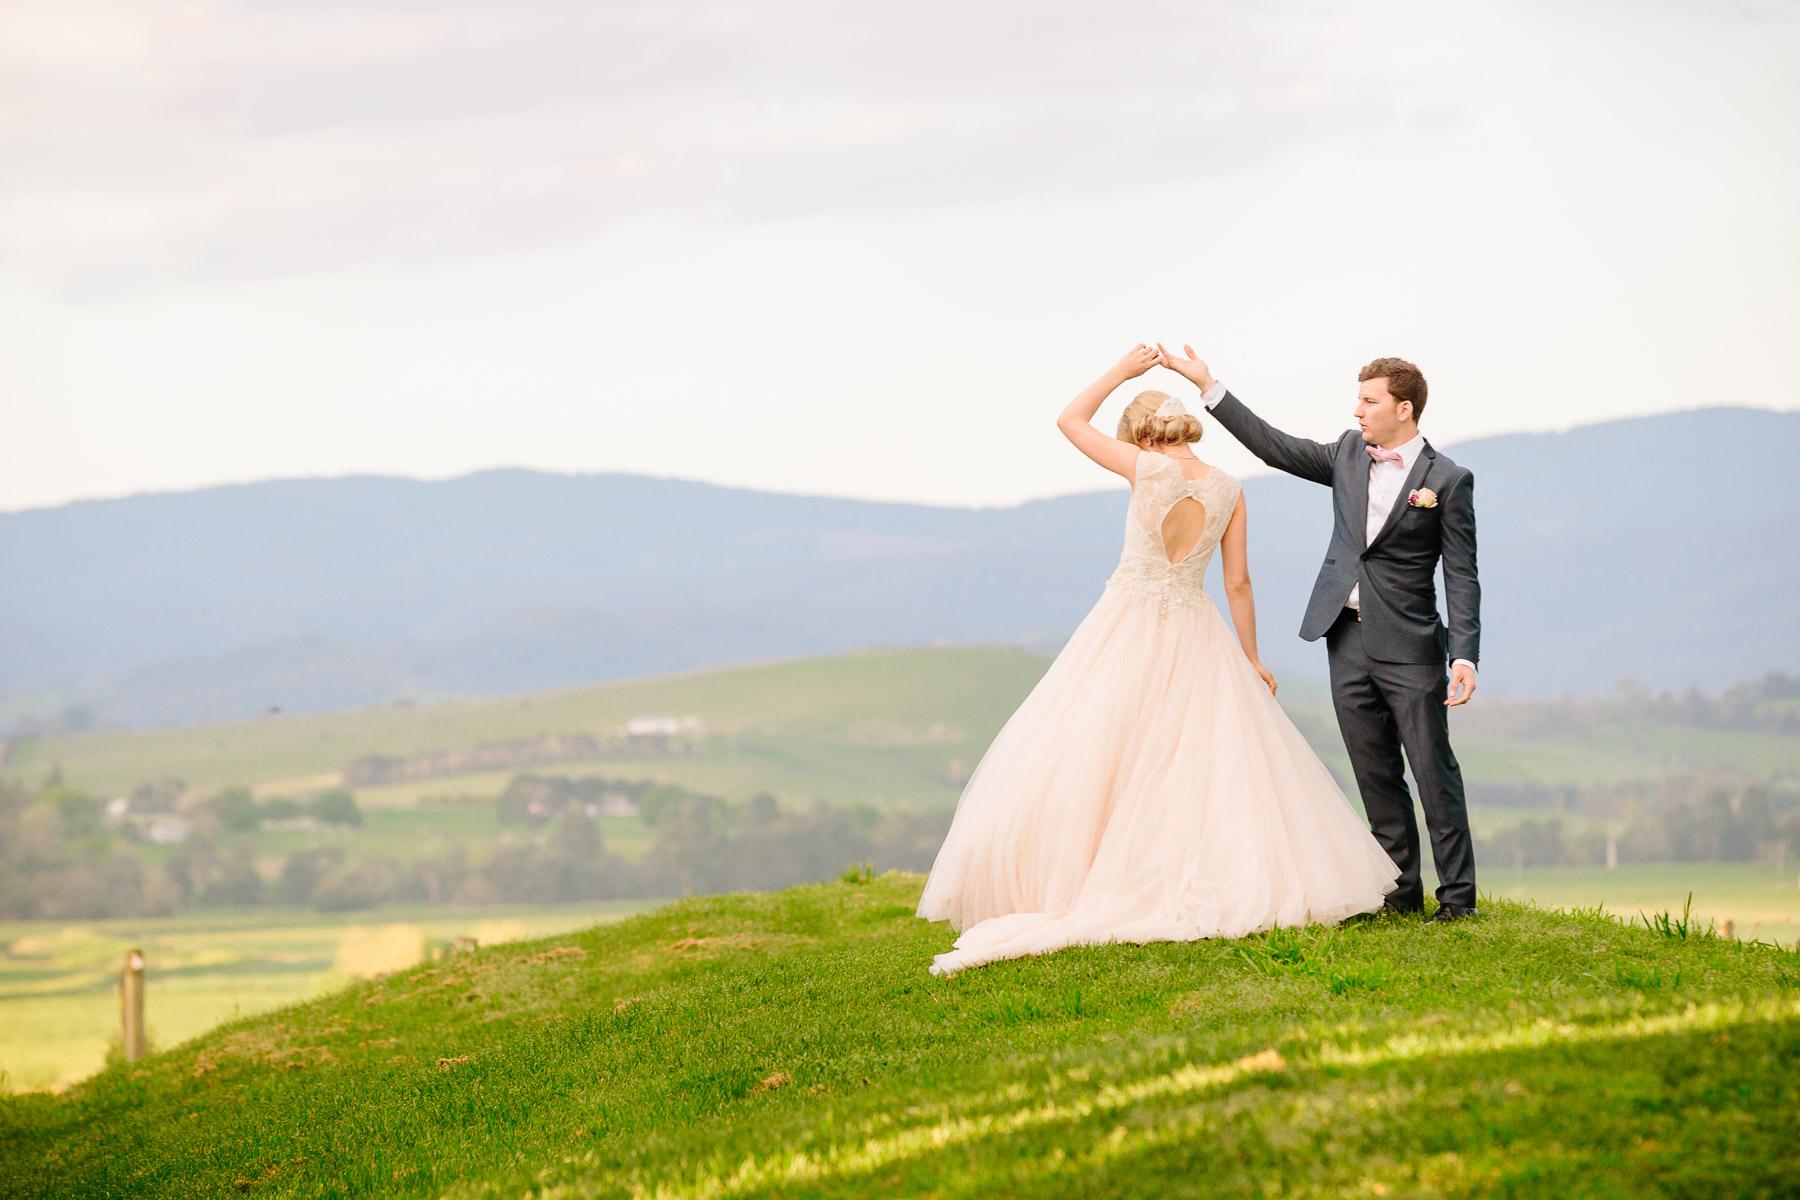 Marnie_and_Charlie_Yarra_Valley_Wedding_Blog-69.jpg